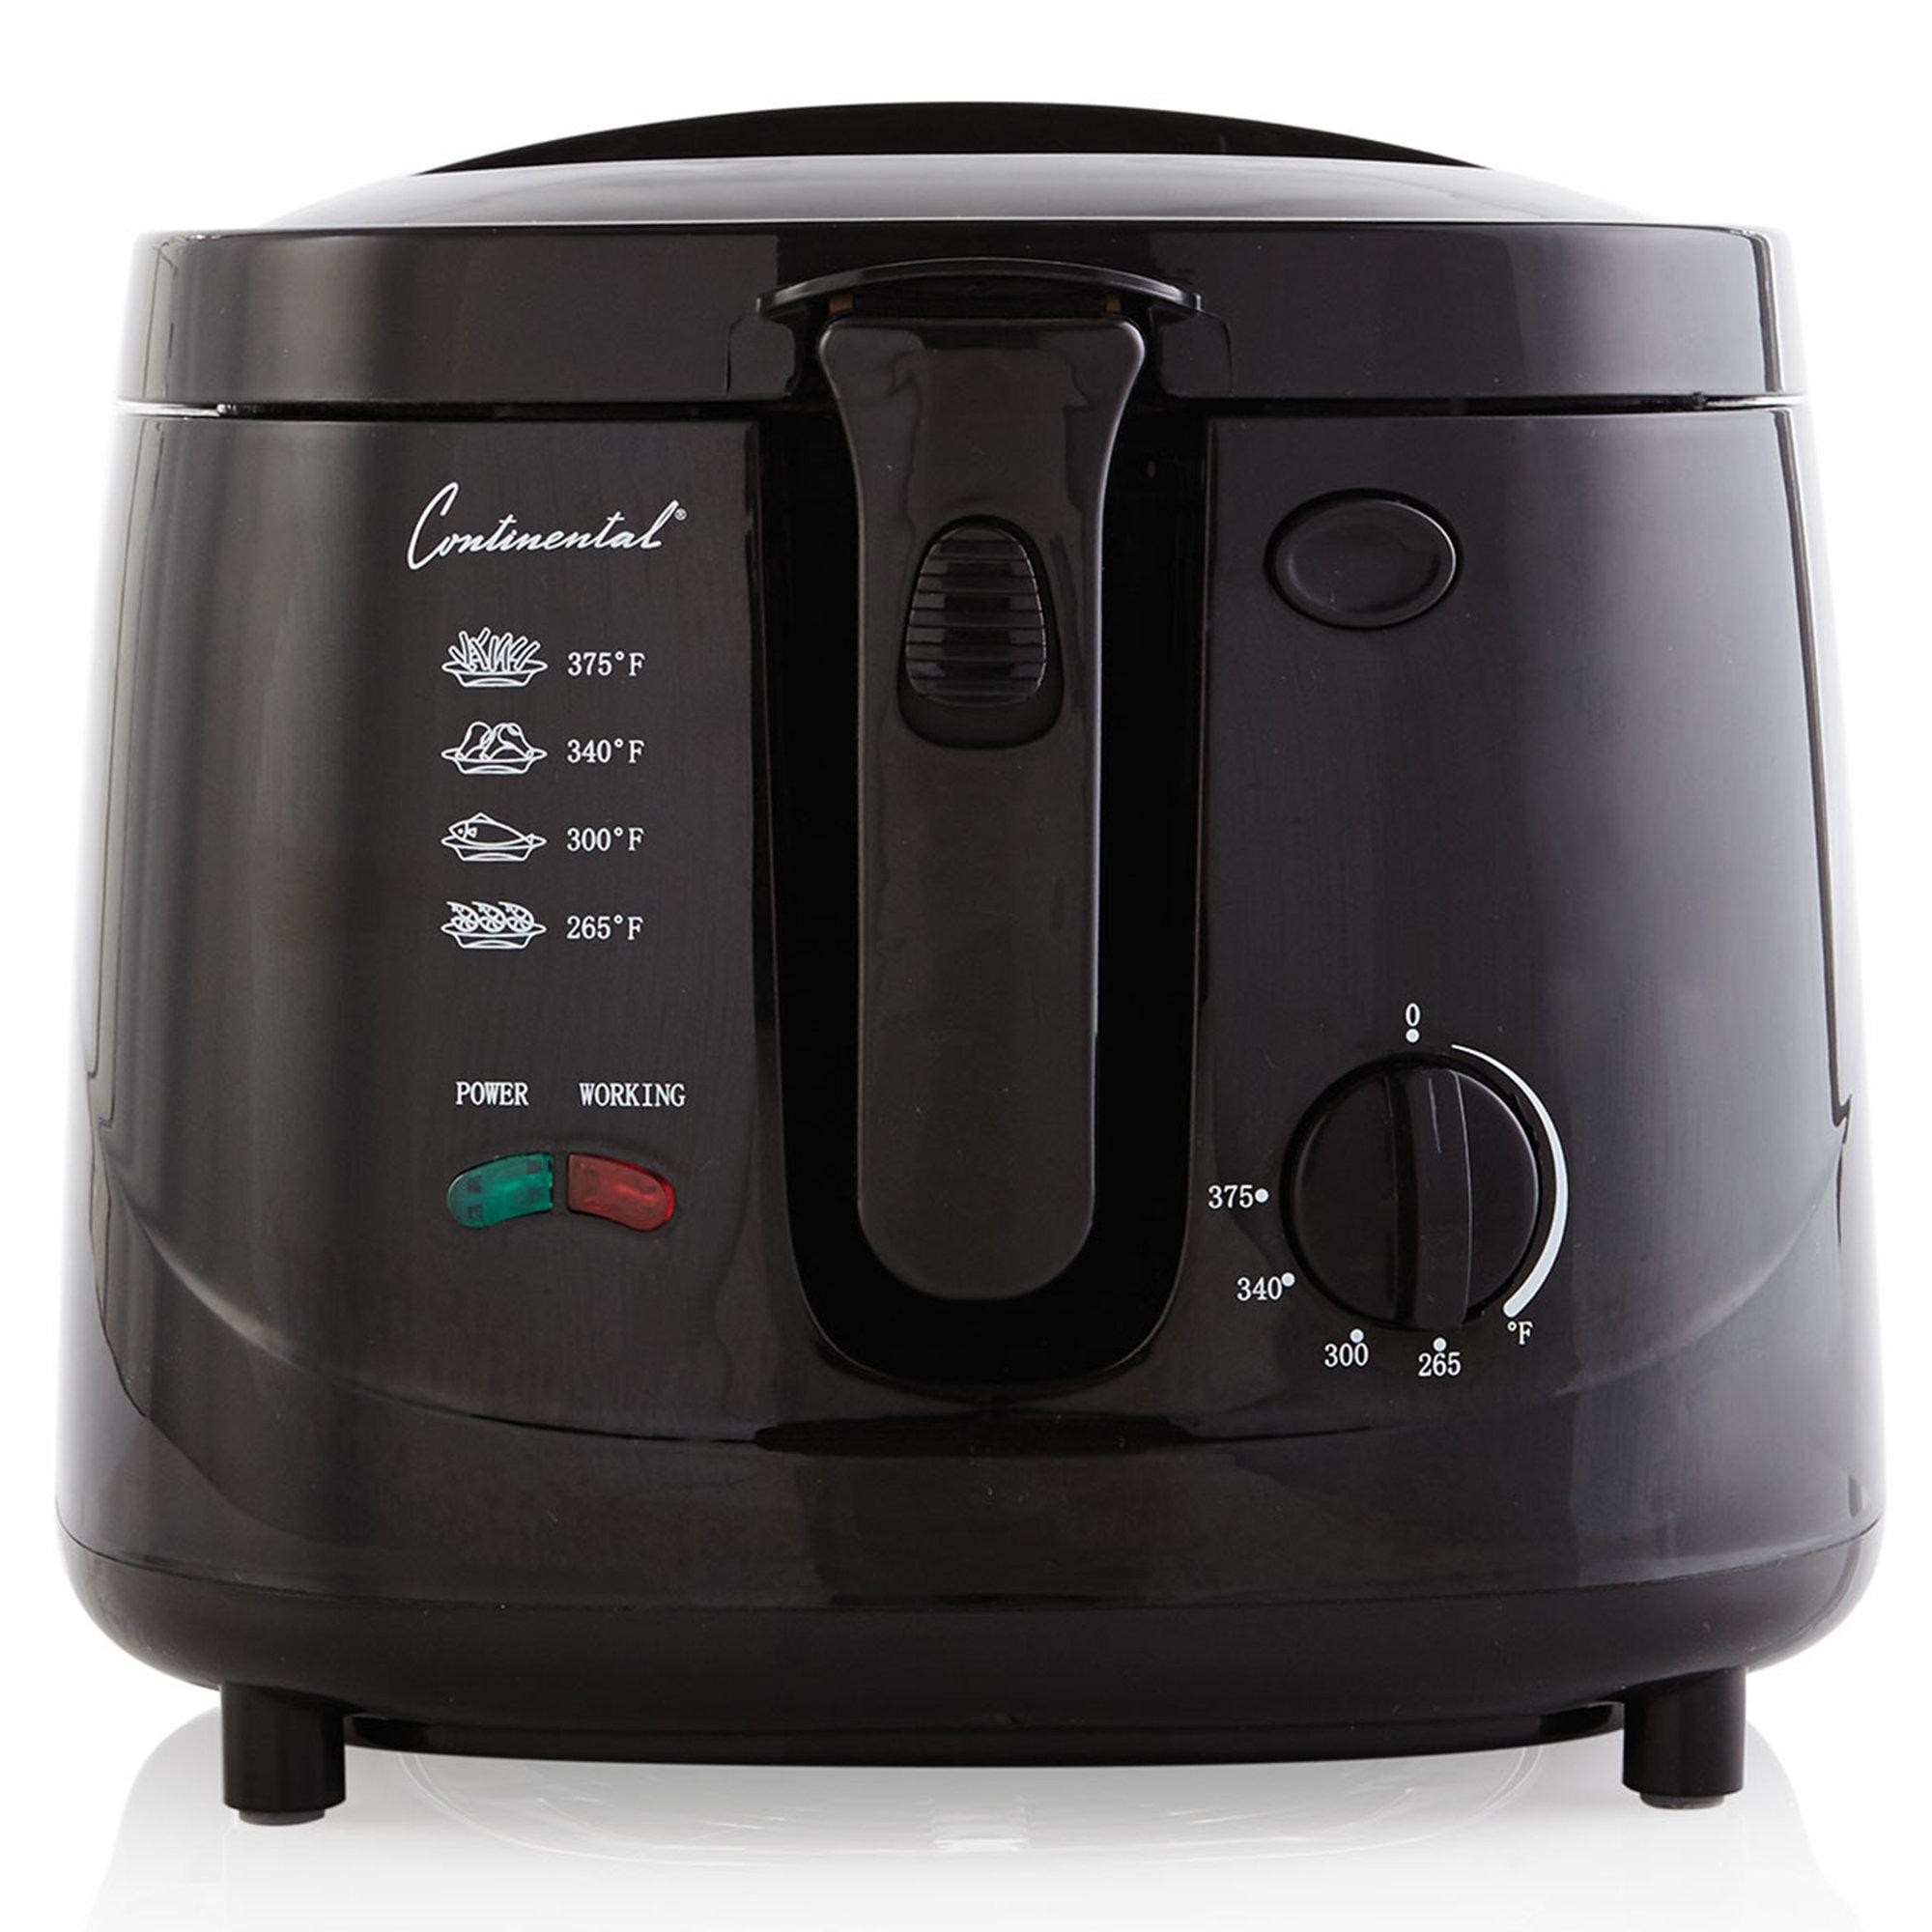 c7f416e909b ContinentalElectric 2.5 Liter Cool Touch Deep Fryer